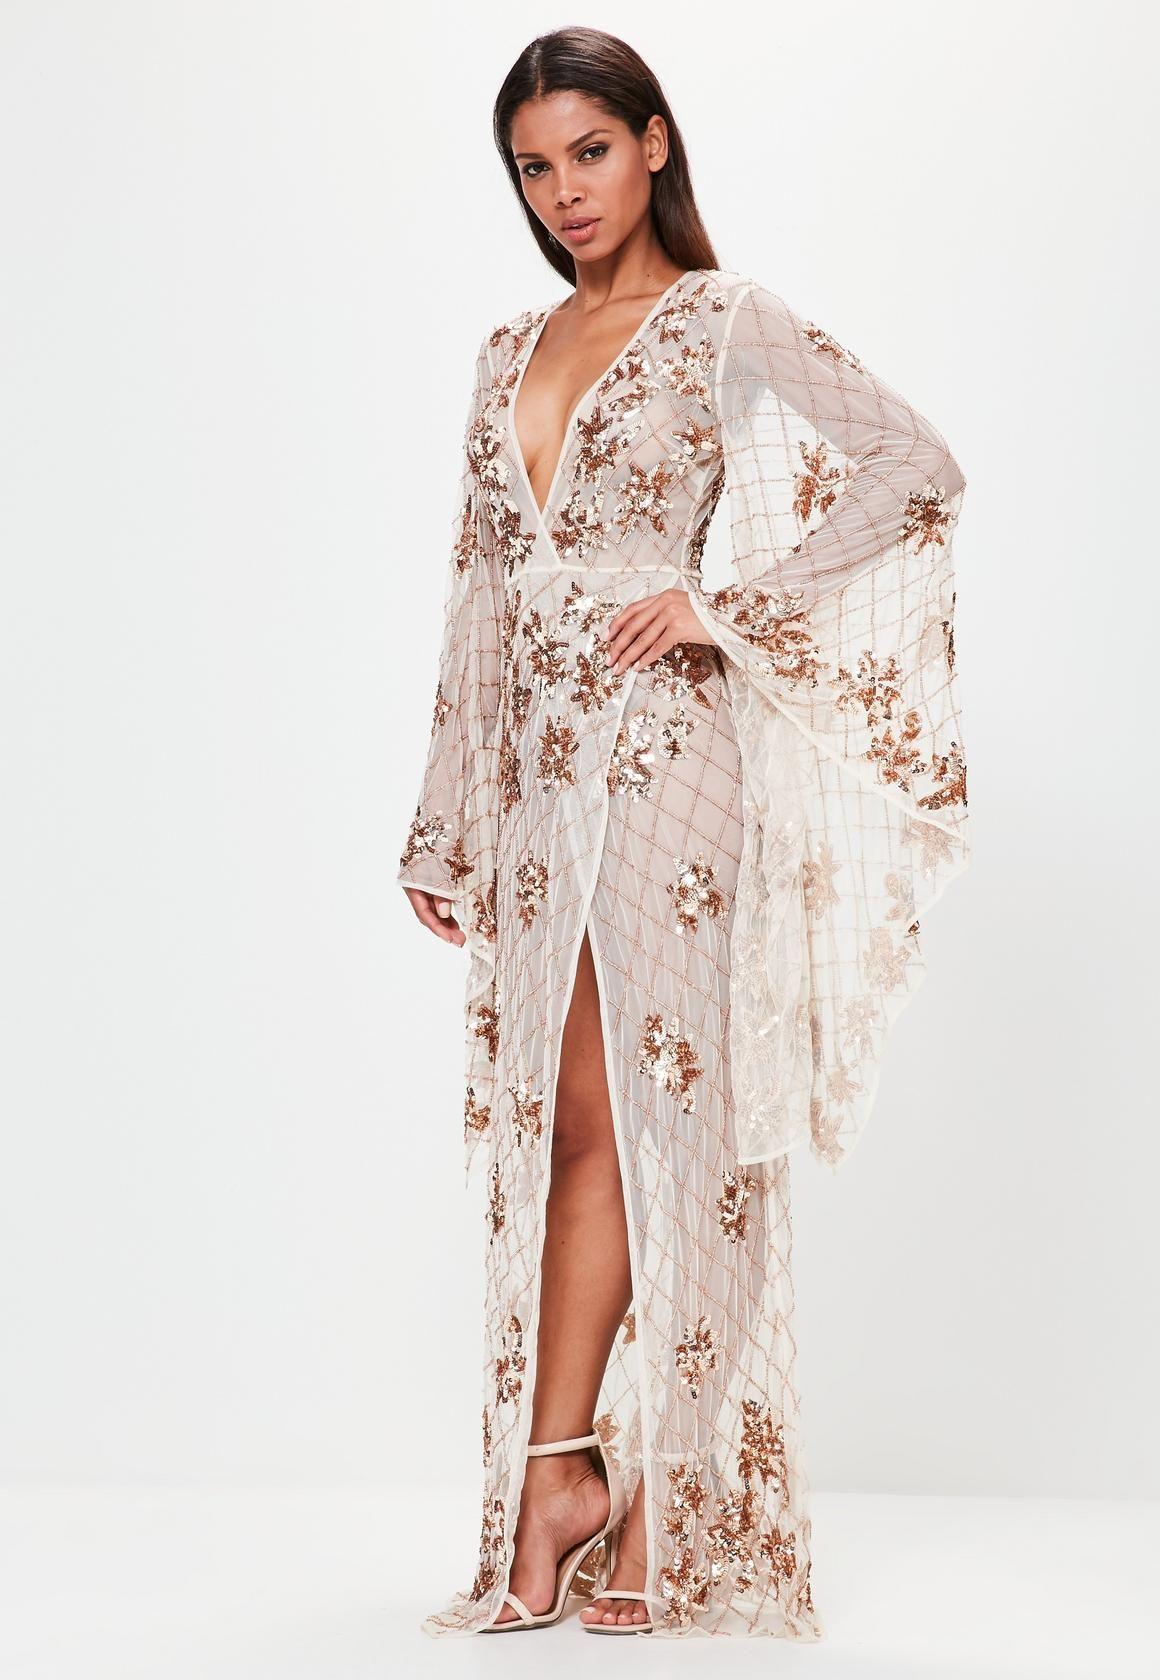 5032a898d870c Peace + Love Nude Kimono Sleeve Embellished Maxi Dress   Luxury ...